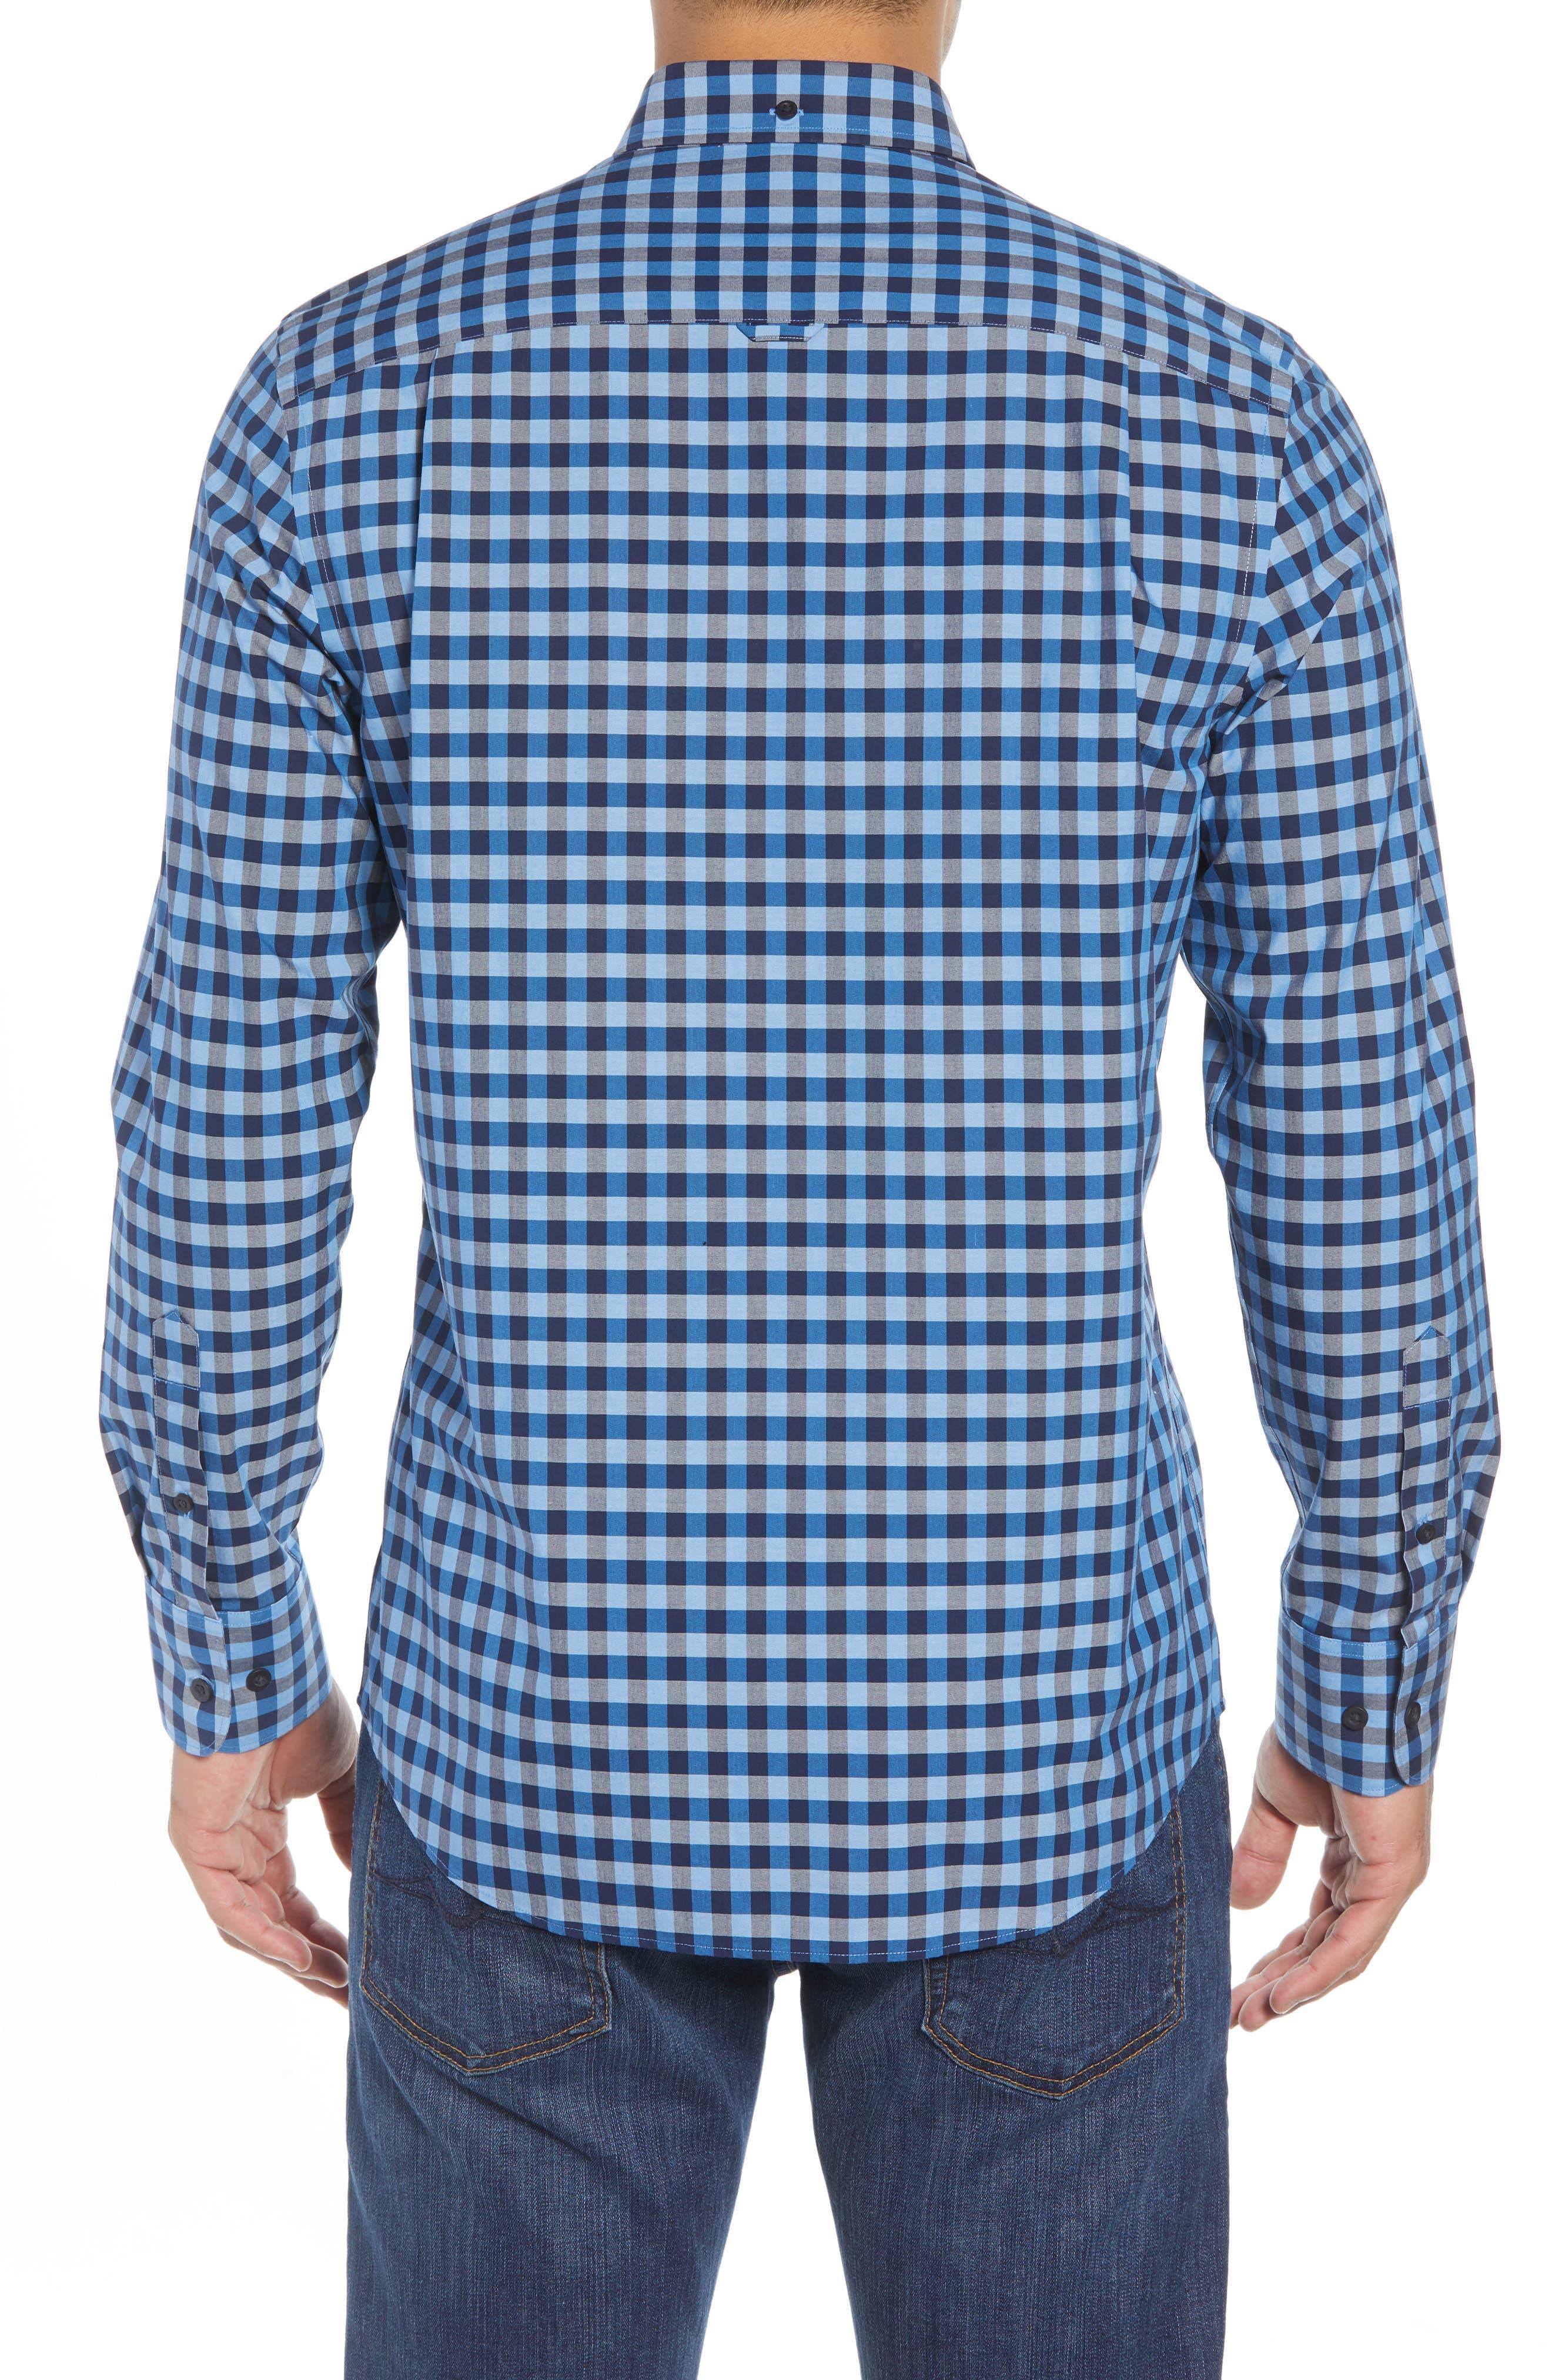 Smartcare<sup>™</sup> Regular Fit Gingham Sport Shirt,                             Alternate thumbnail 2, color,                             BLUE CAMP NAVY GINGHAM